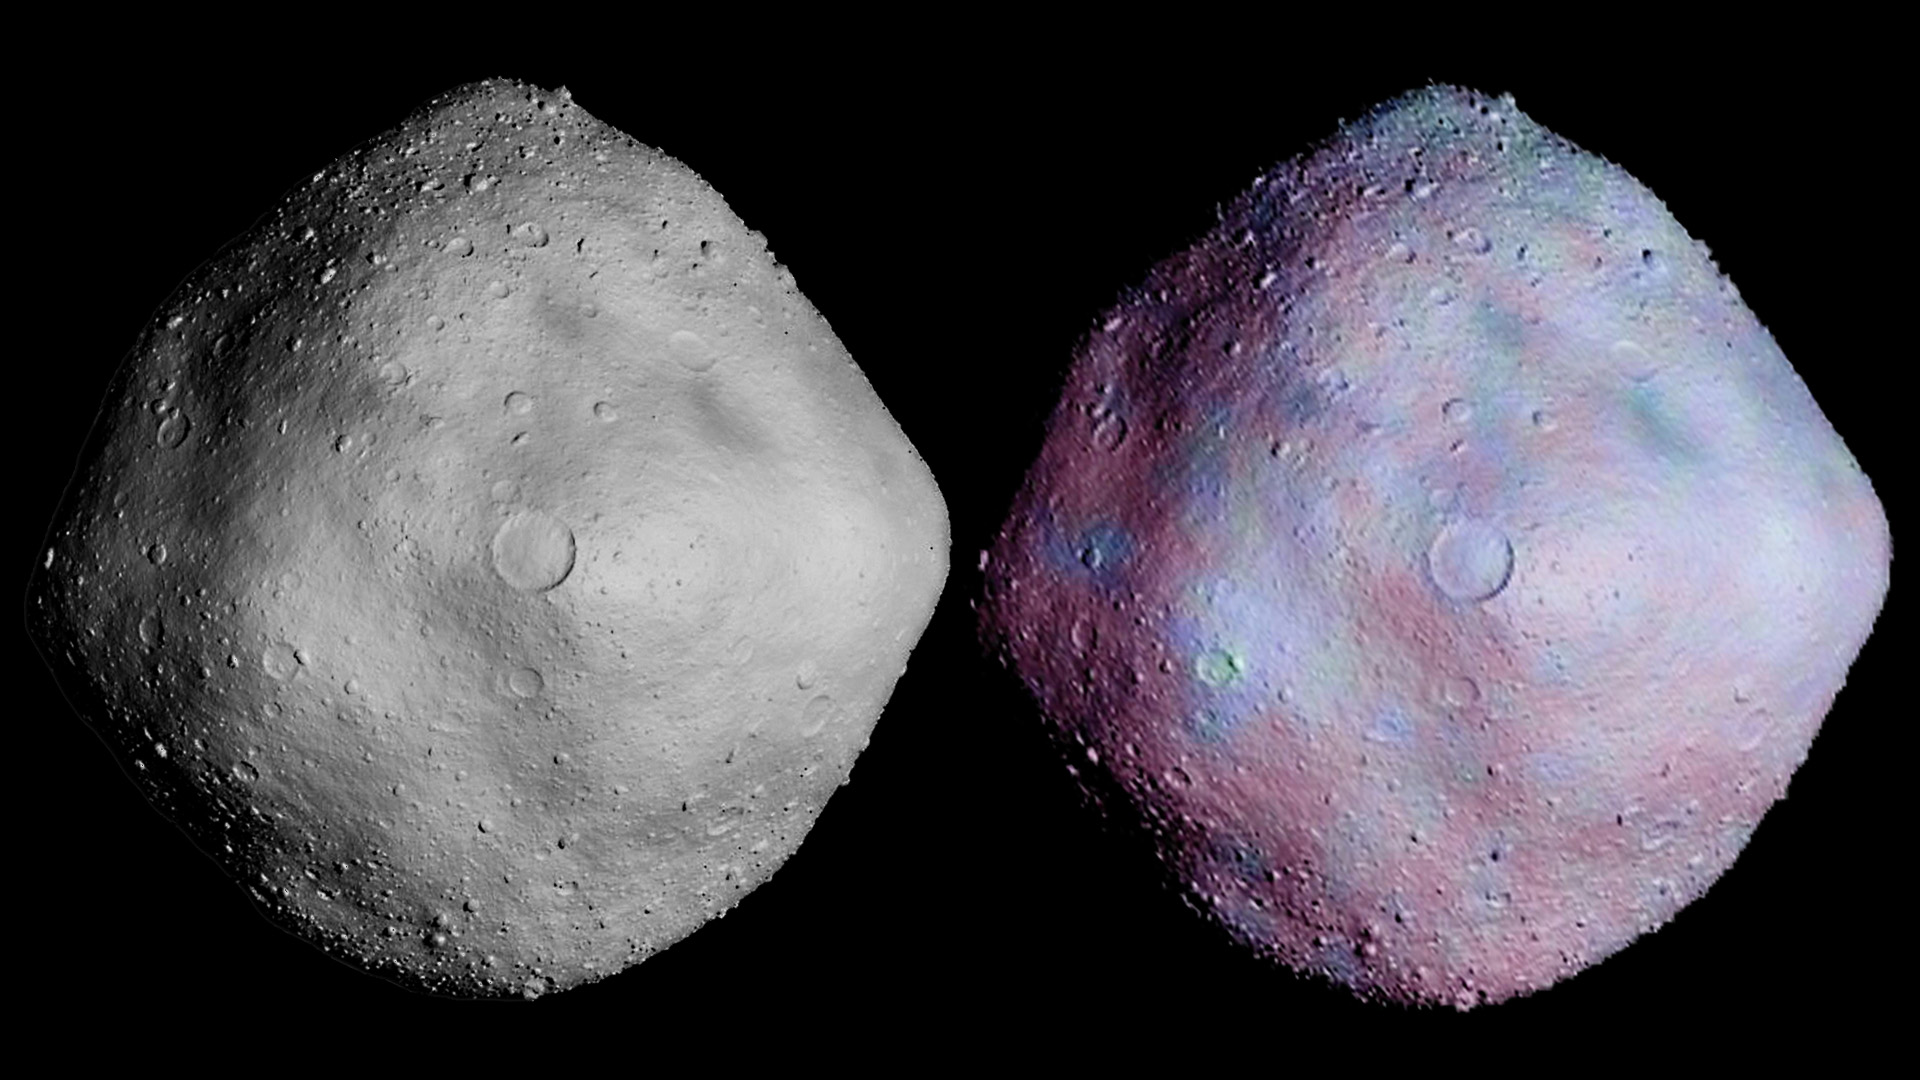 asteroid 1999 rq36 - HD1920×1080